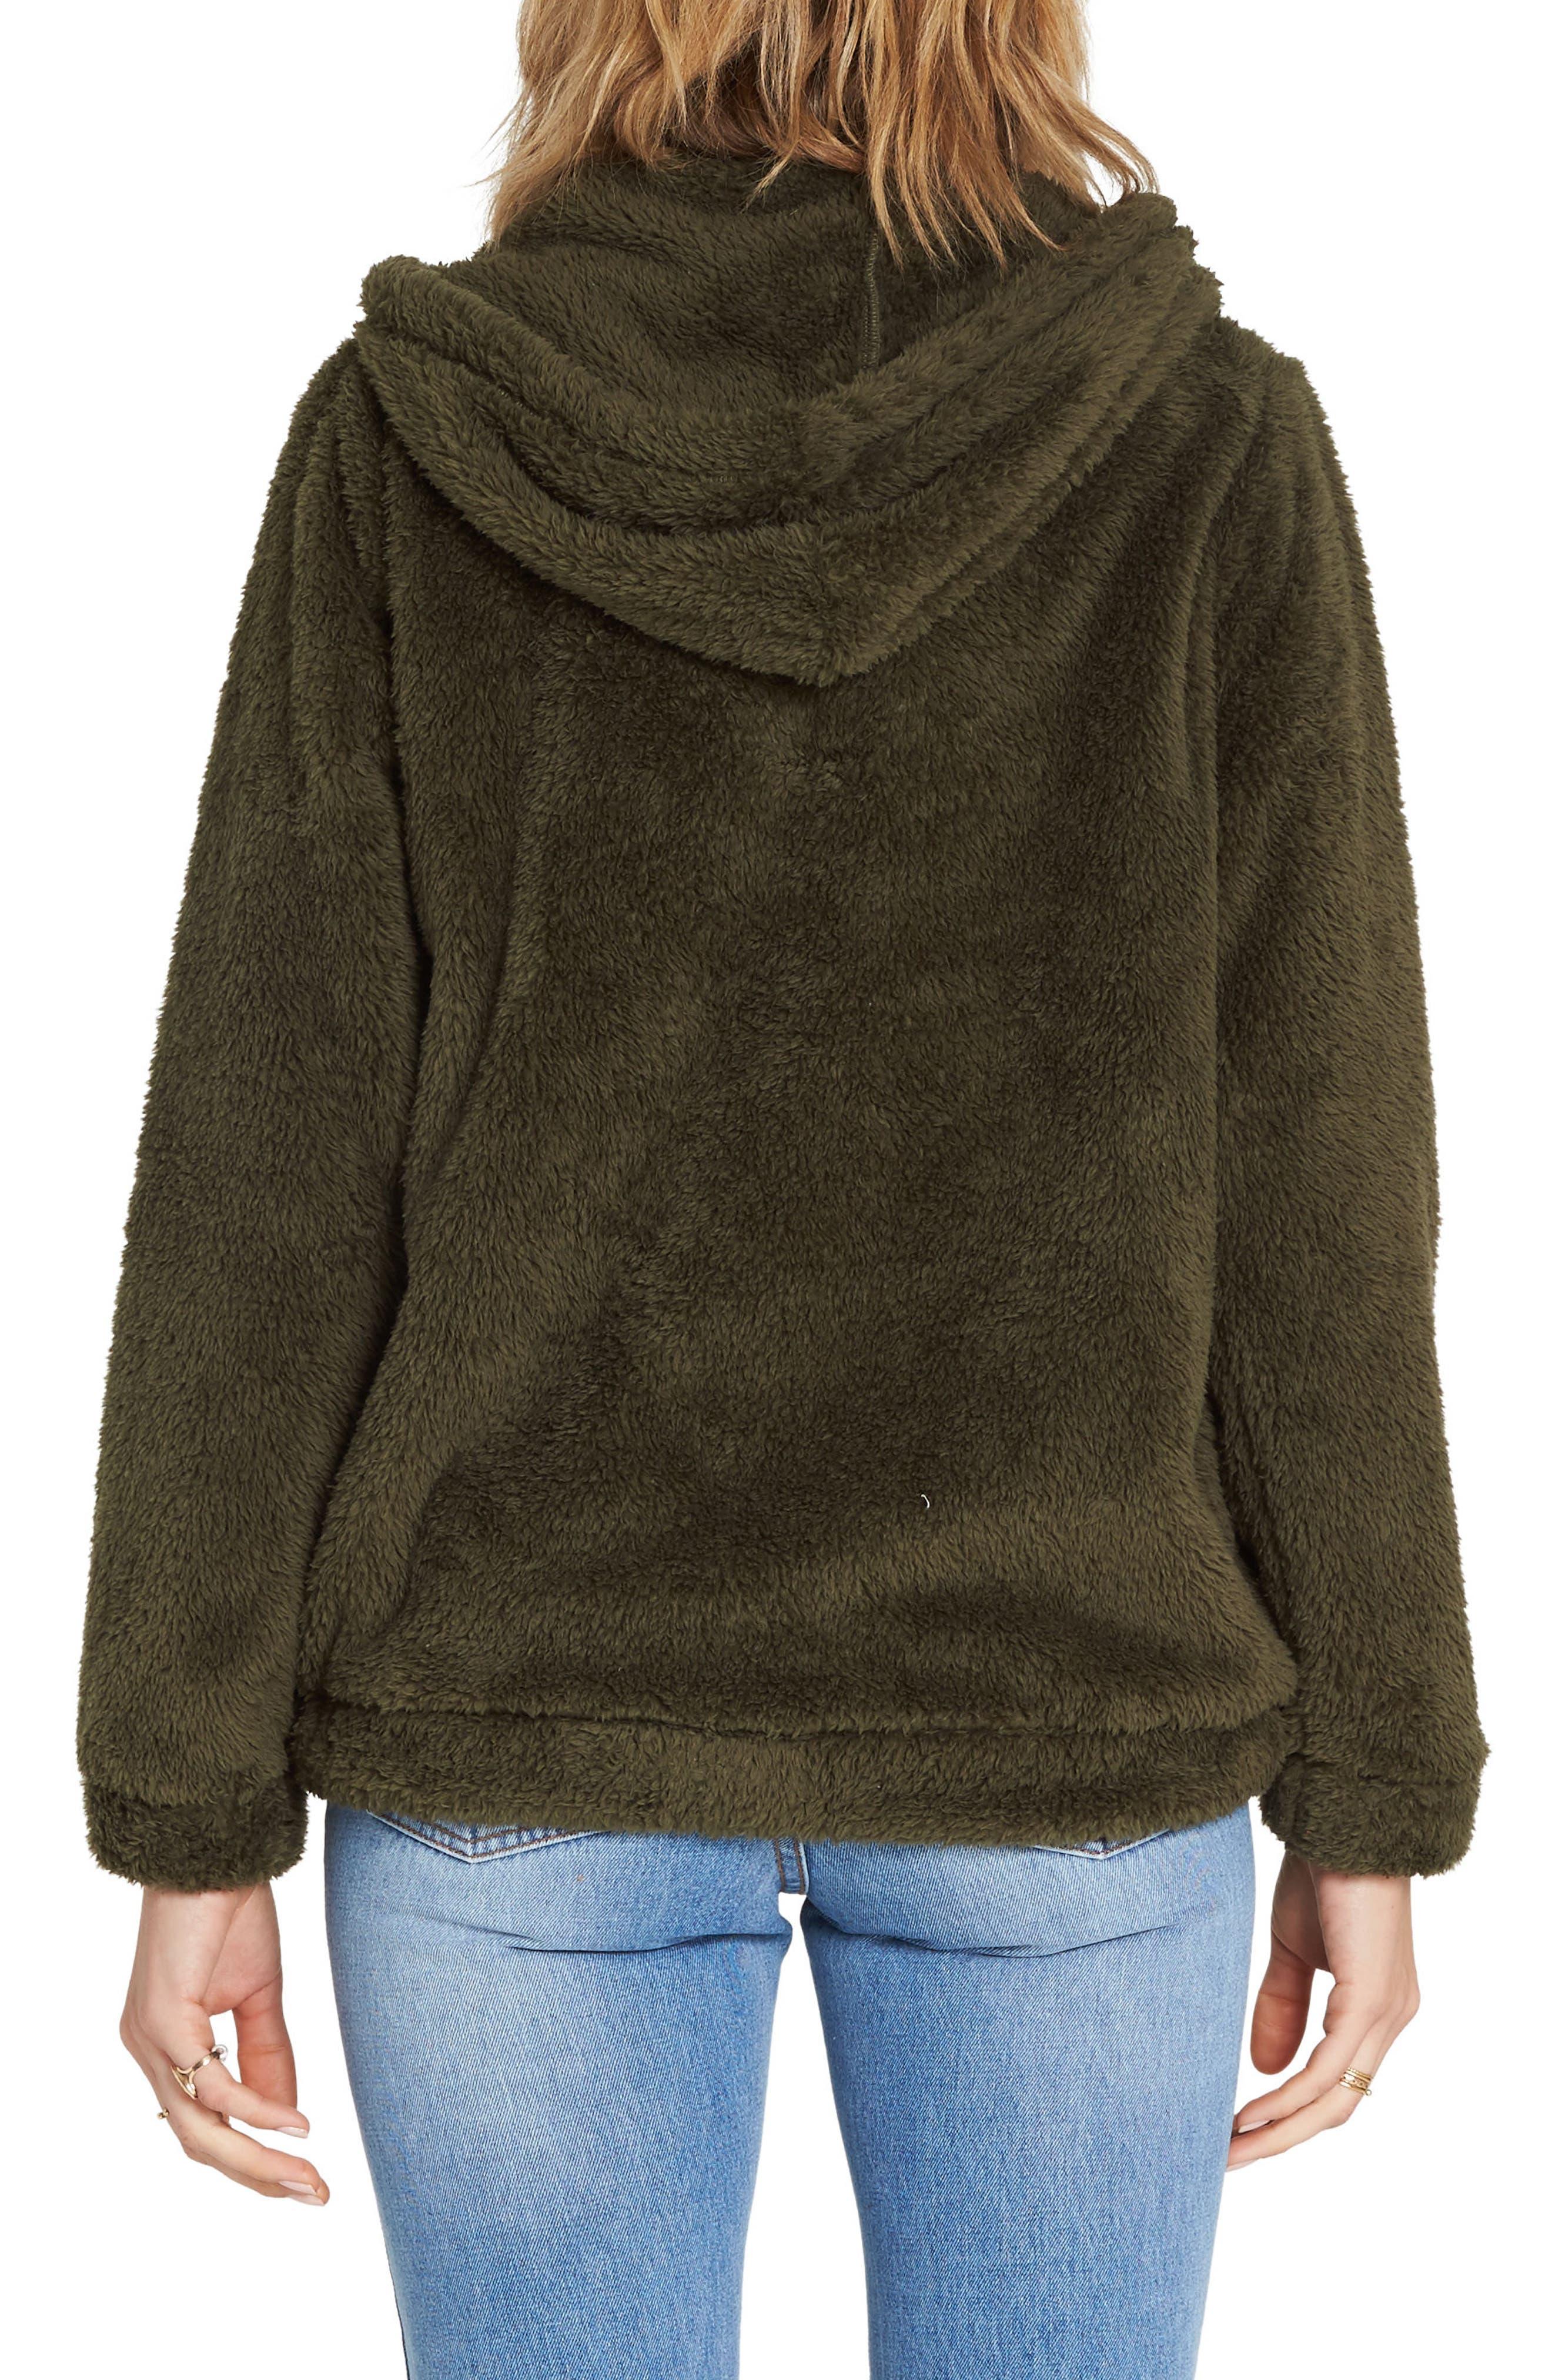 Cozy for Keeps Fleece Zip Hoodie,                             Alternate thumbnail 2, color,                             OLIVE